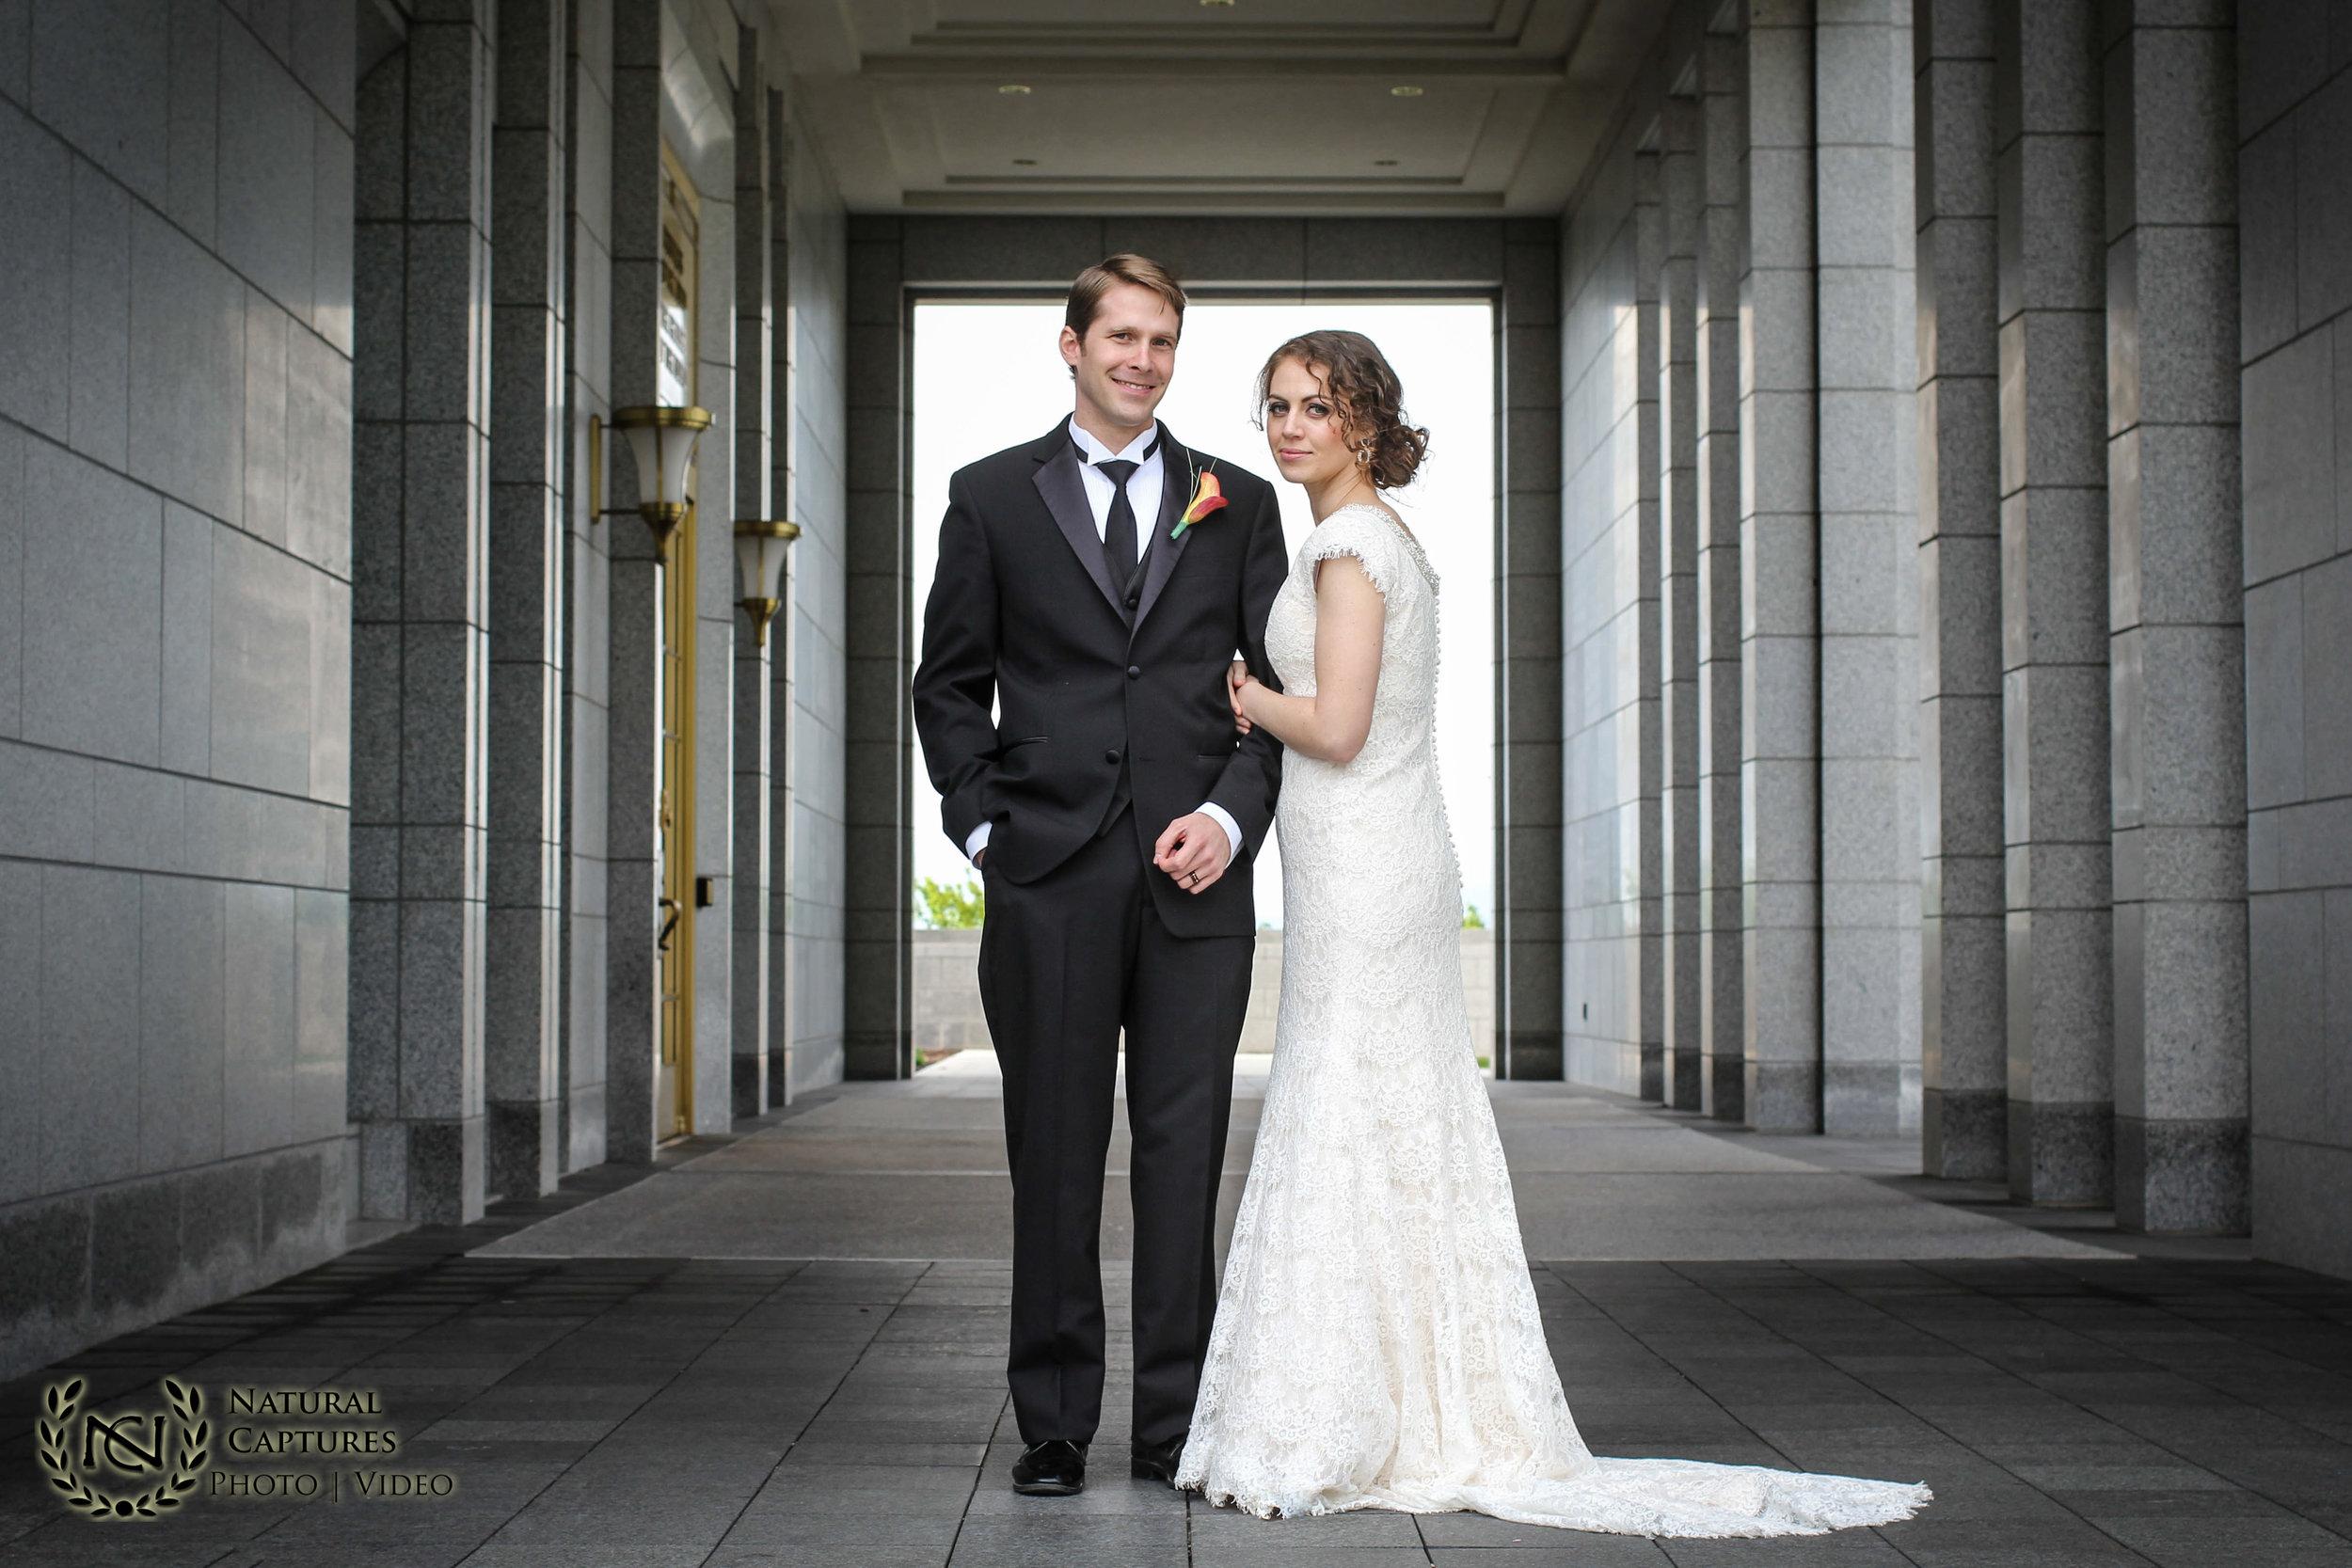 Draper Utah Temple Wedding Photography (9 of 12)